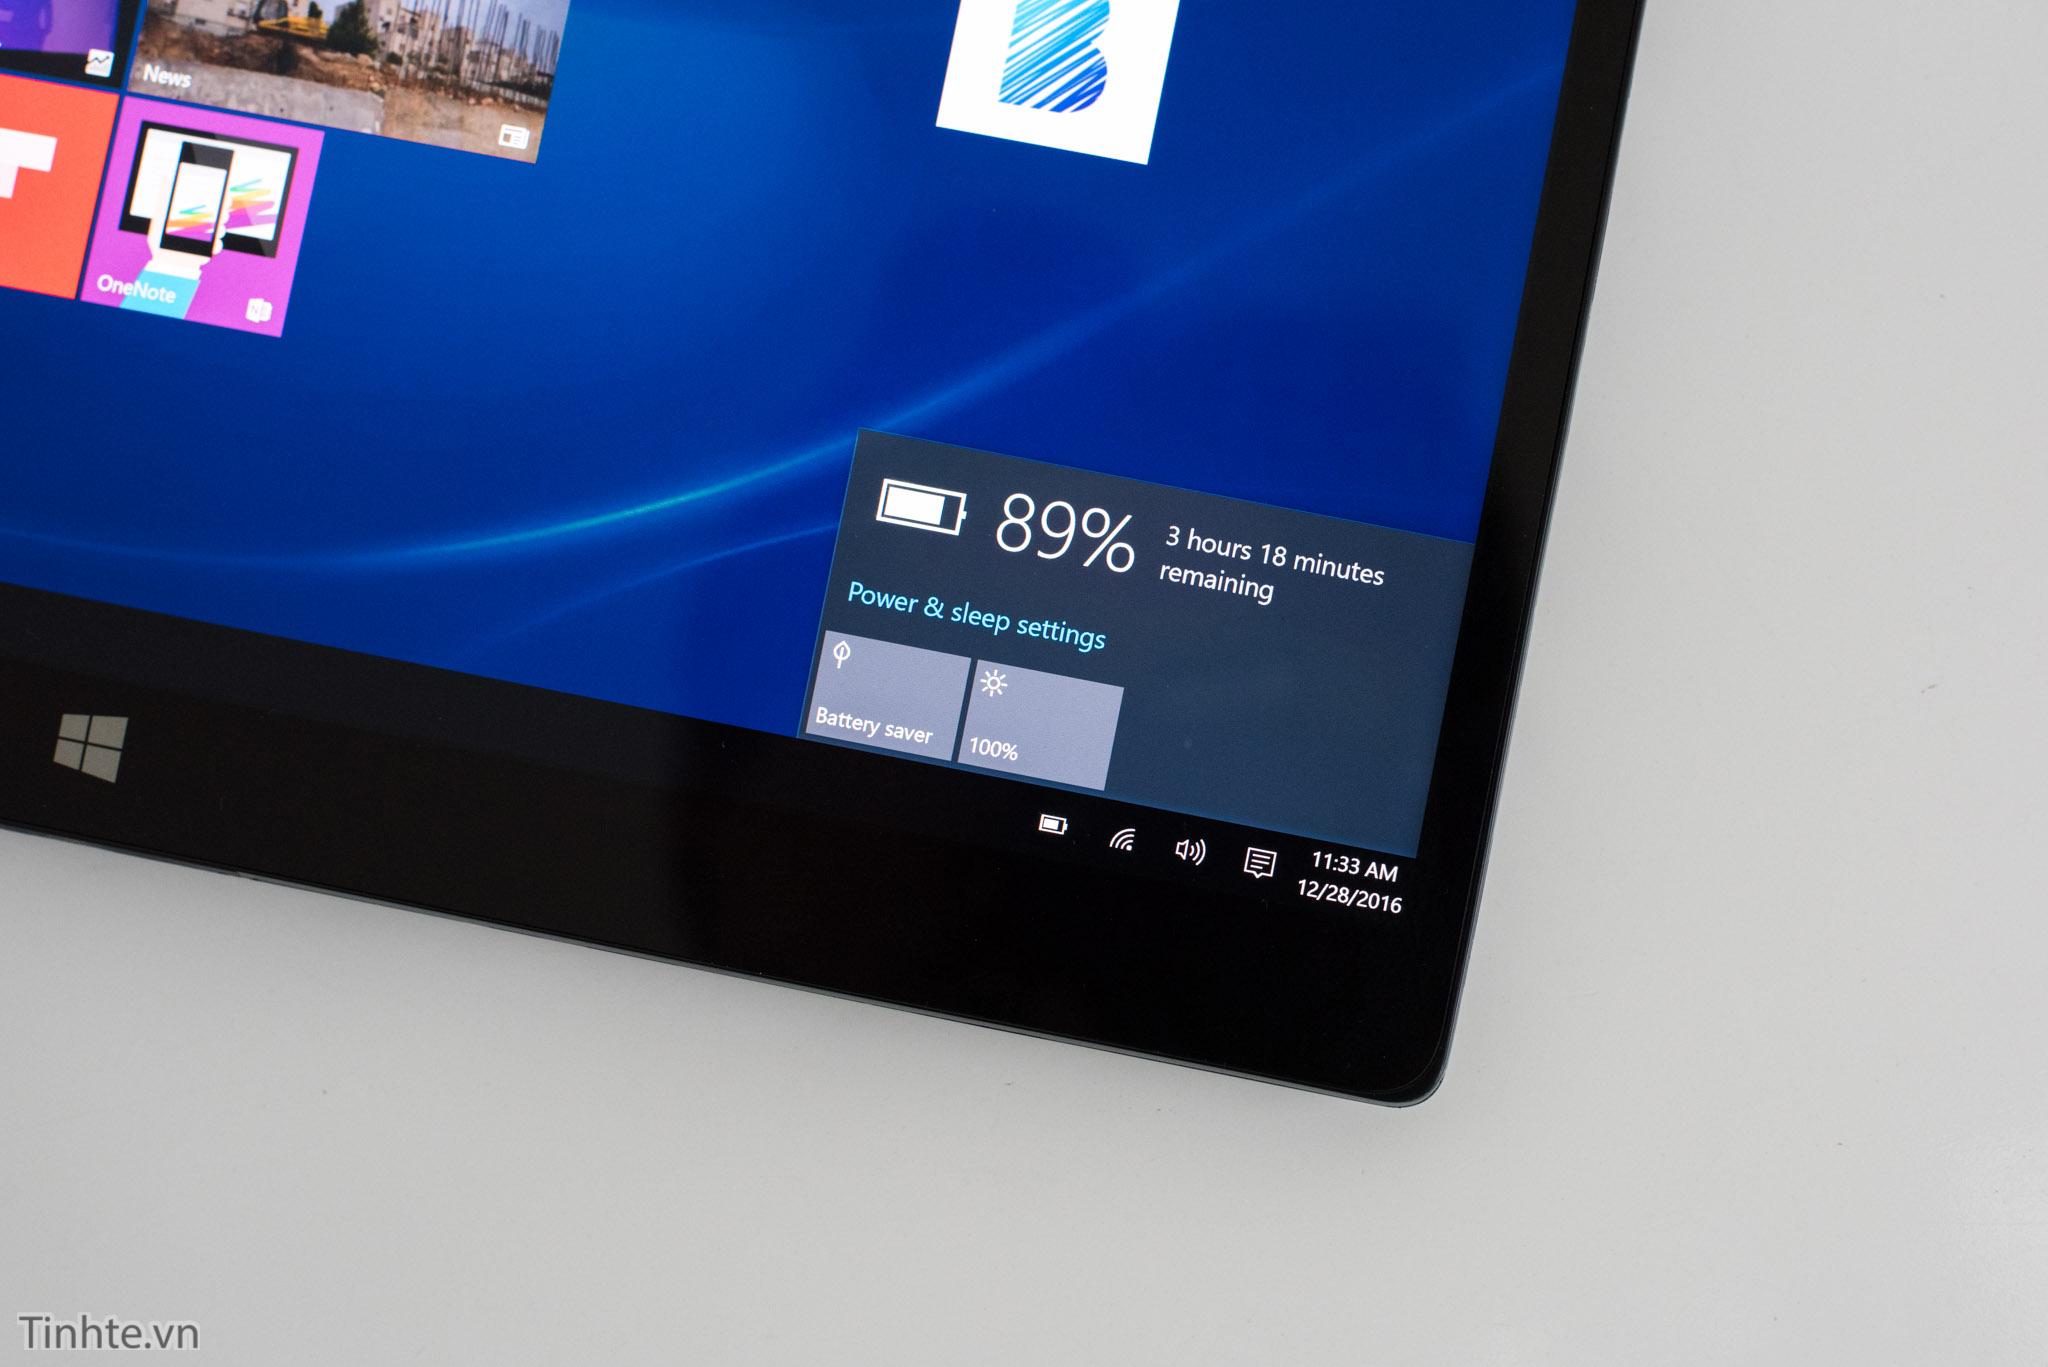 Dell PW7015MC_tinhte.vn 6.jpg